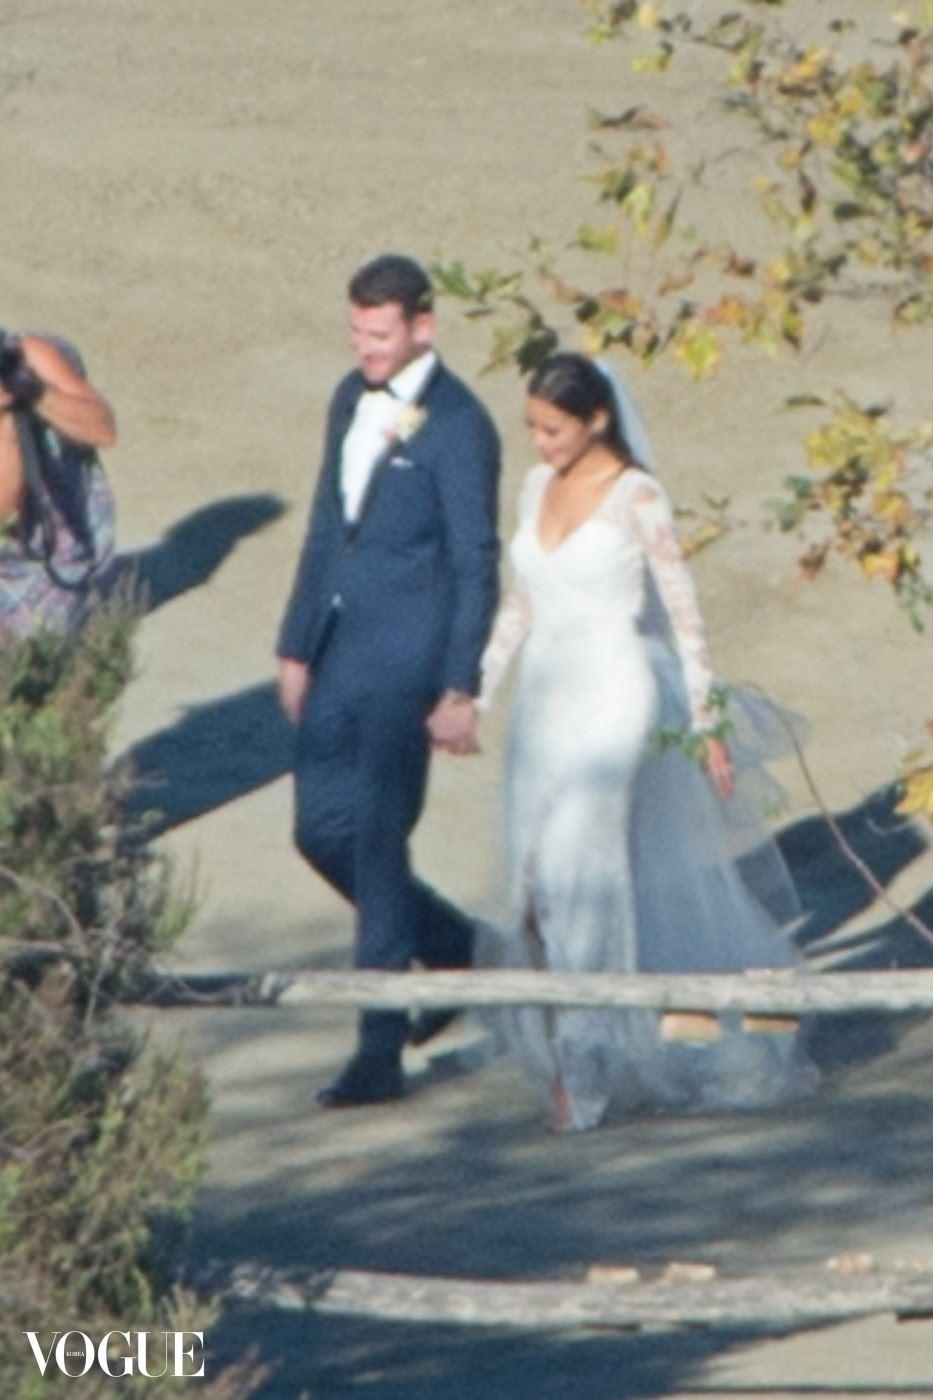 Jamie Chung and Bryan Greenberg Get Married on Halloween